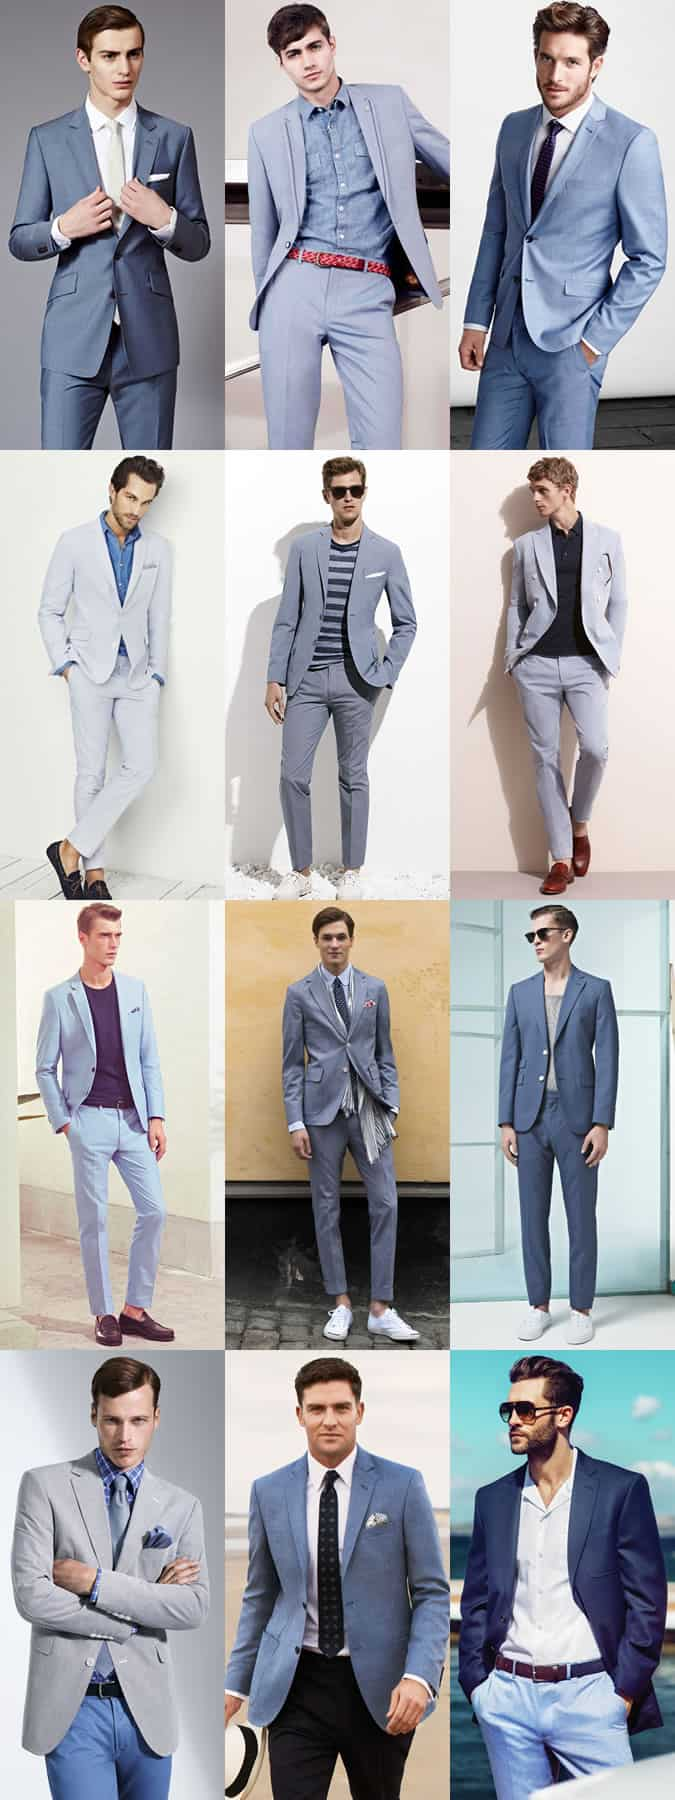 5 Key Men's Suit Styles For SS14